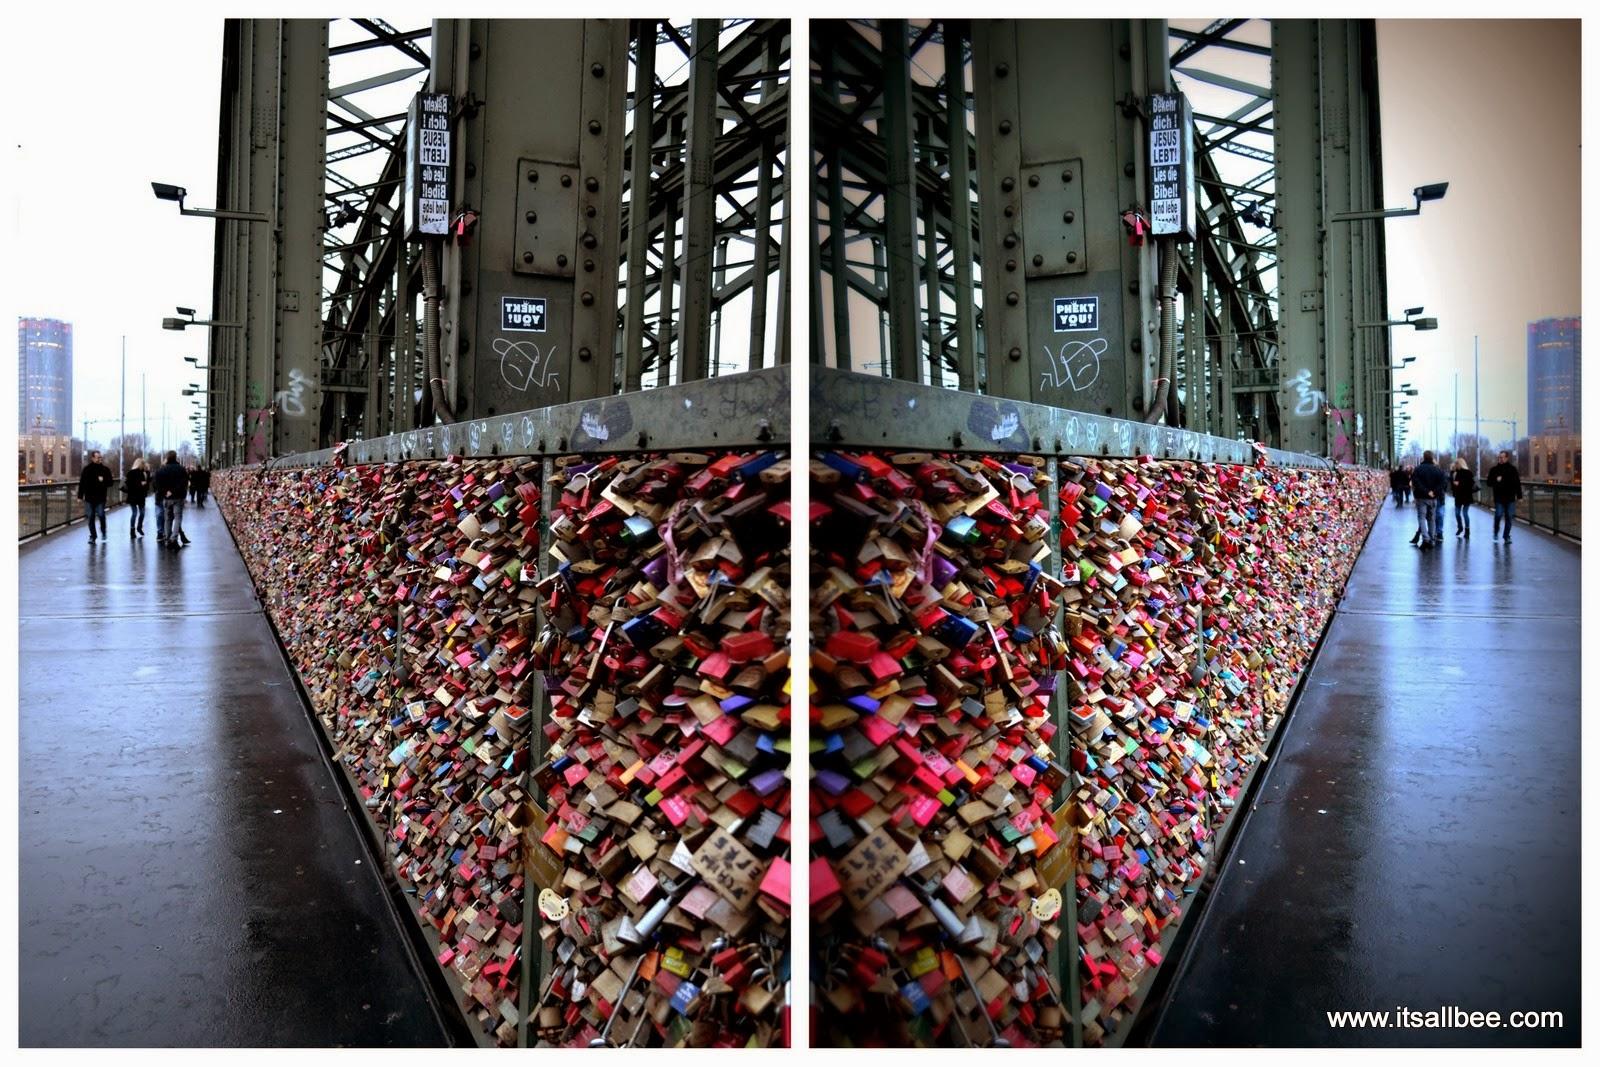 Cologne's Love Locks Bridge